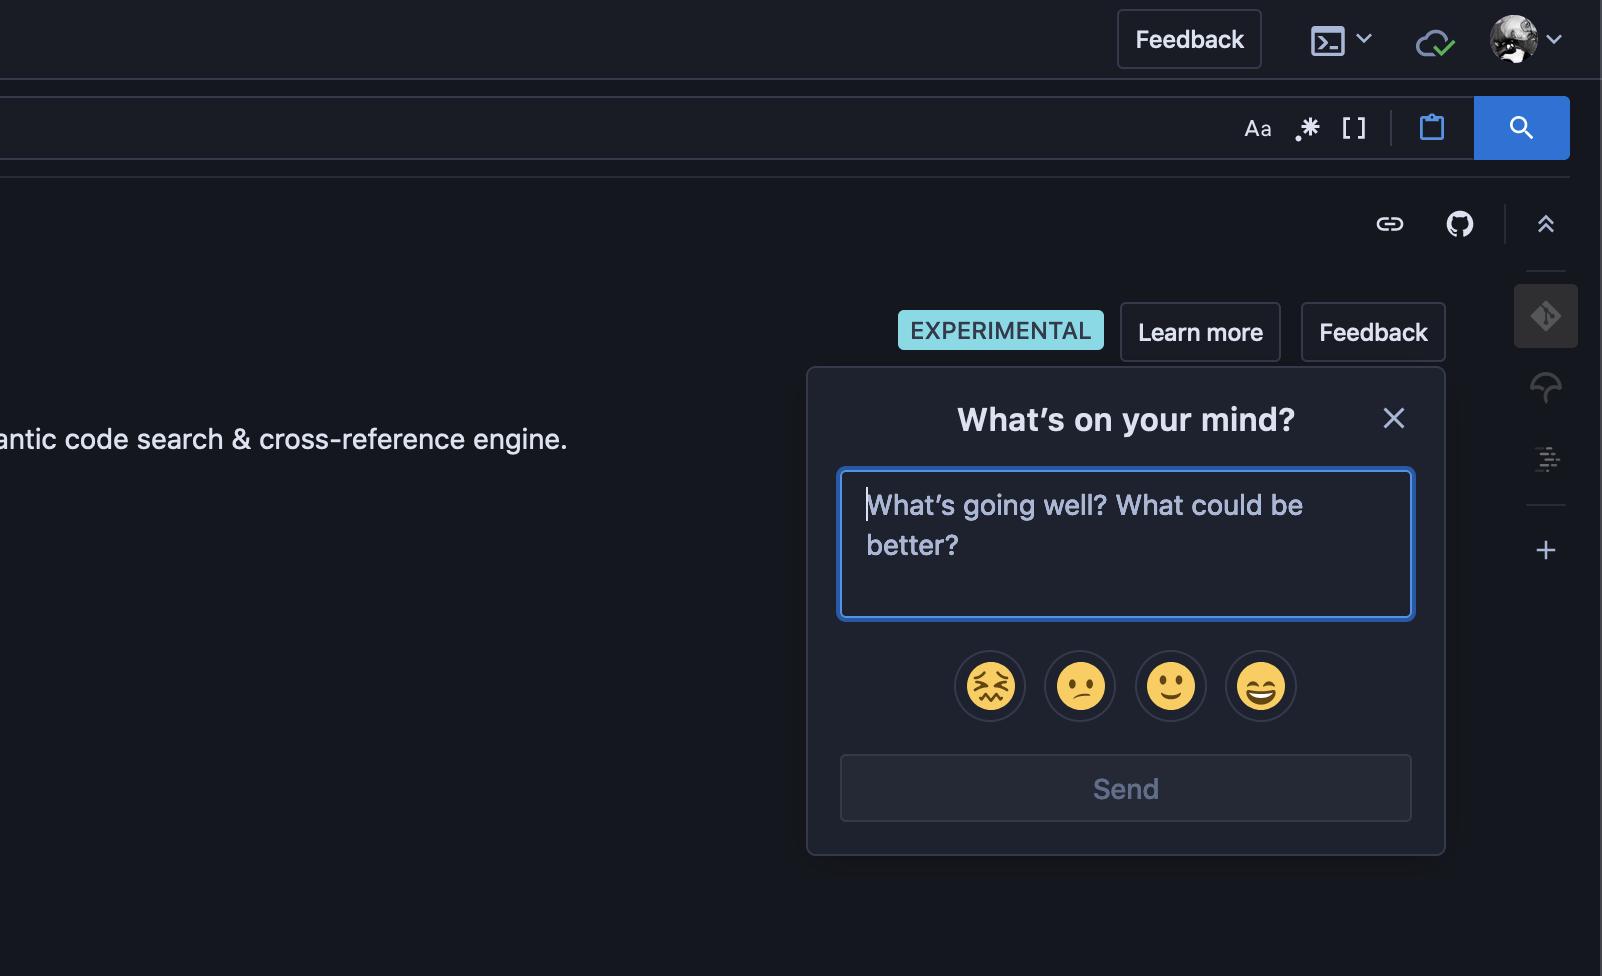 The new feedback widget with various emojis